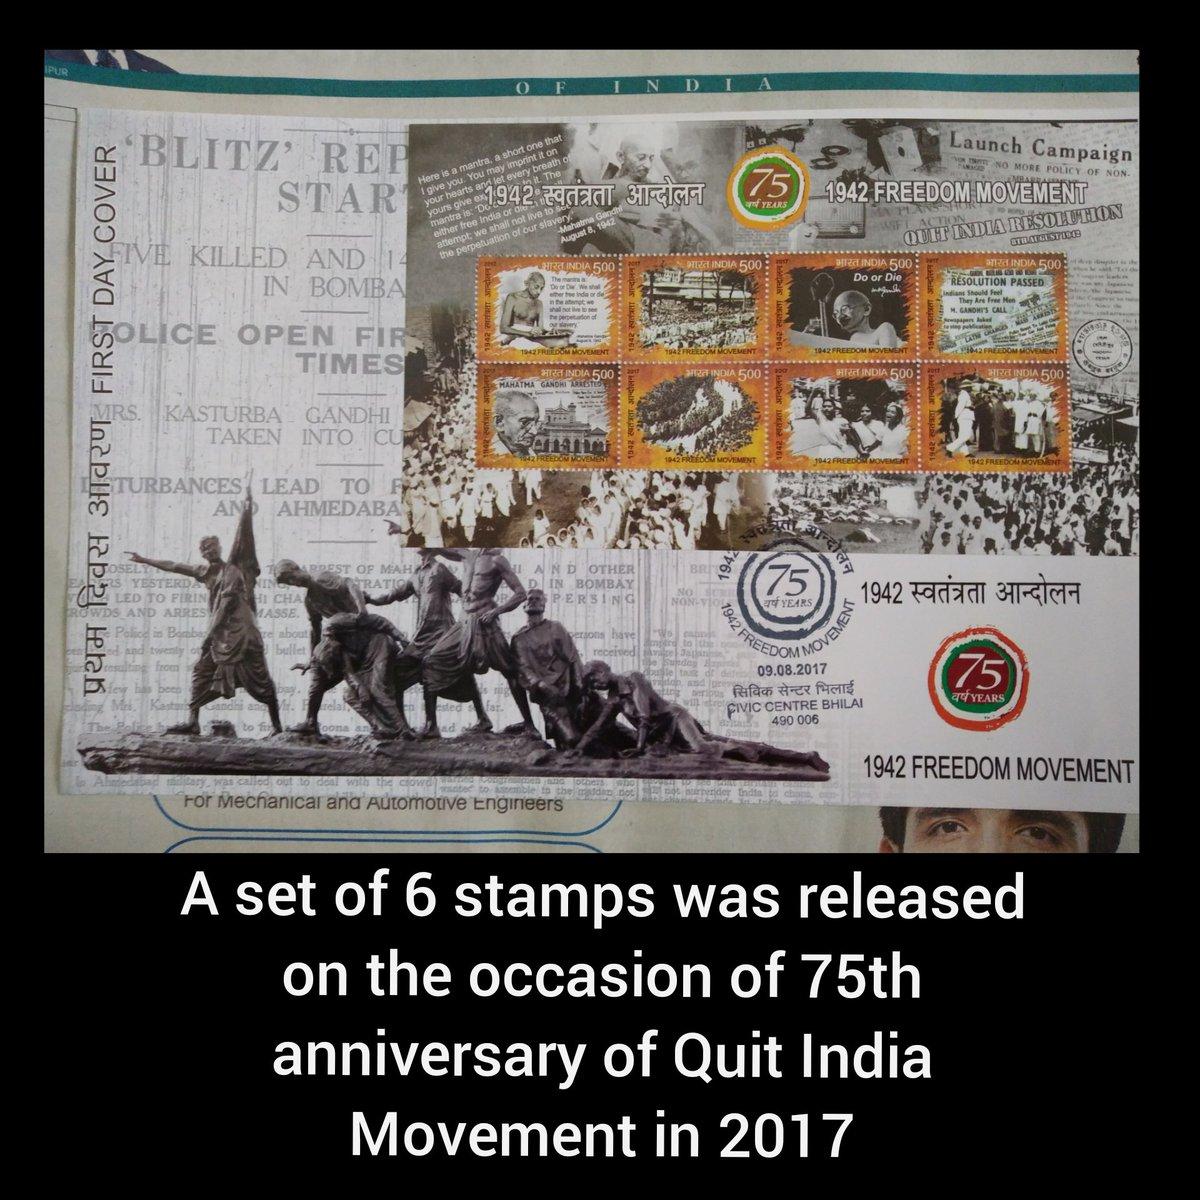 Long live Quit India Movement.  #Gandhiji #History #hisdarkmaterials #Gandhi #Indian #historyofindia #magazine #magazines #QuitIndiaMovement #QuitIndiaMovementDay #QuitIndiaMovement #QuitIndiaDay #quit #Chhattisgarhpic.twitter.com/9Q5Q6kqPEH